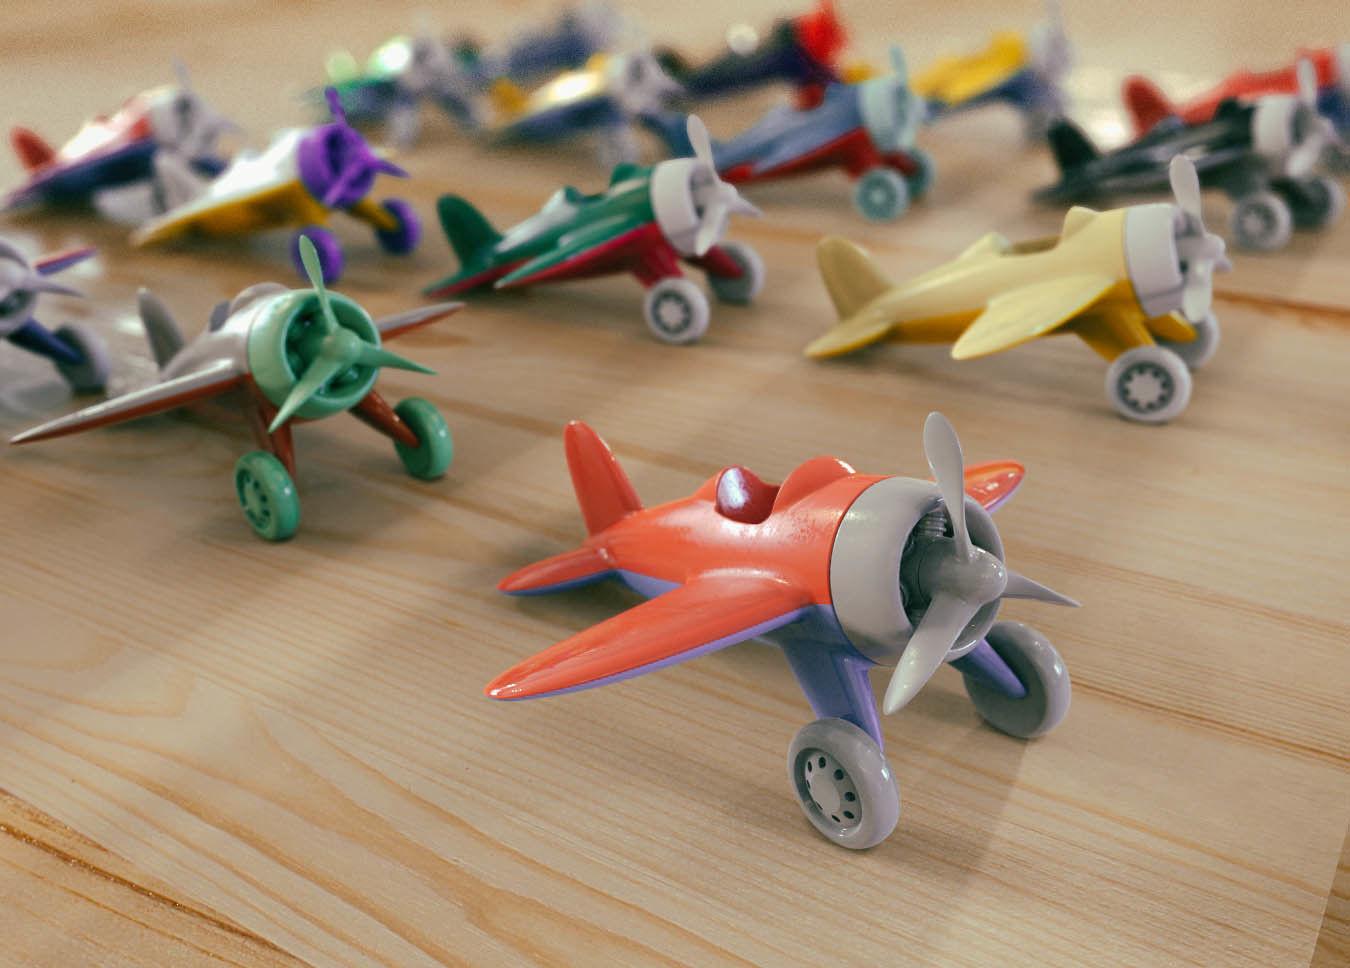 Toy Air Plane